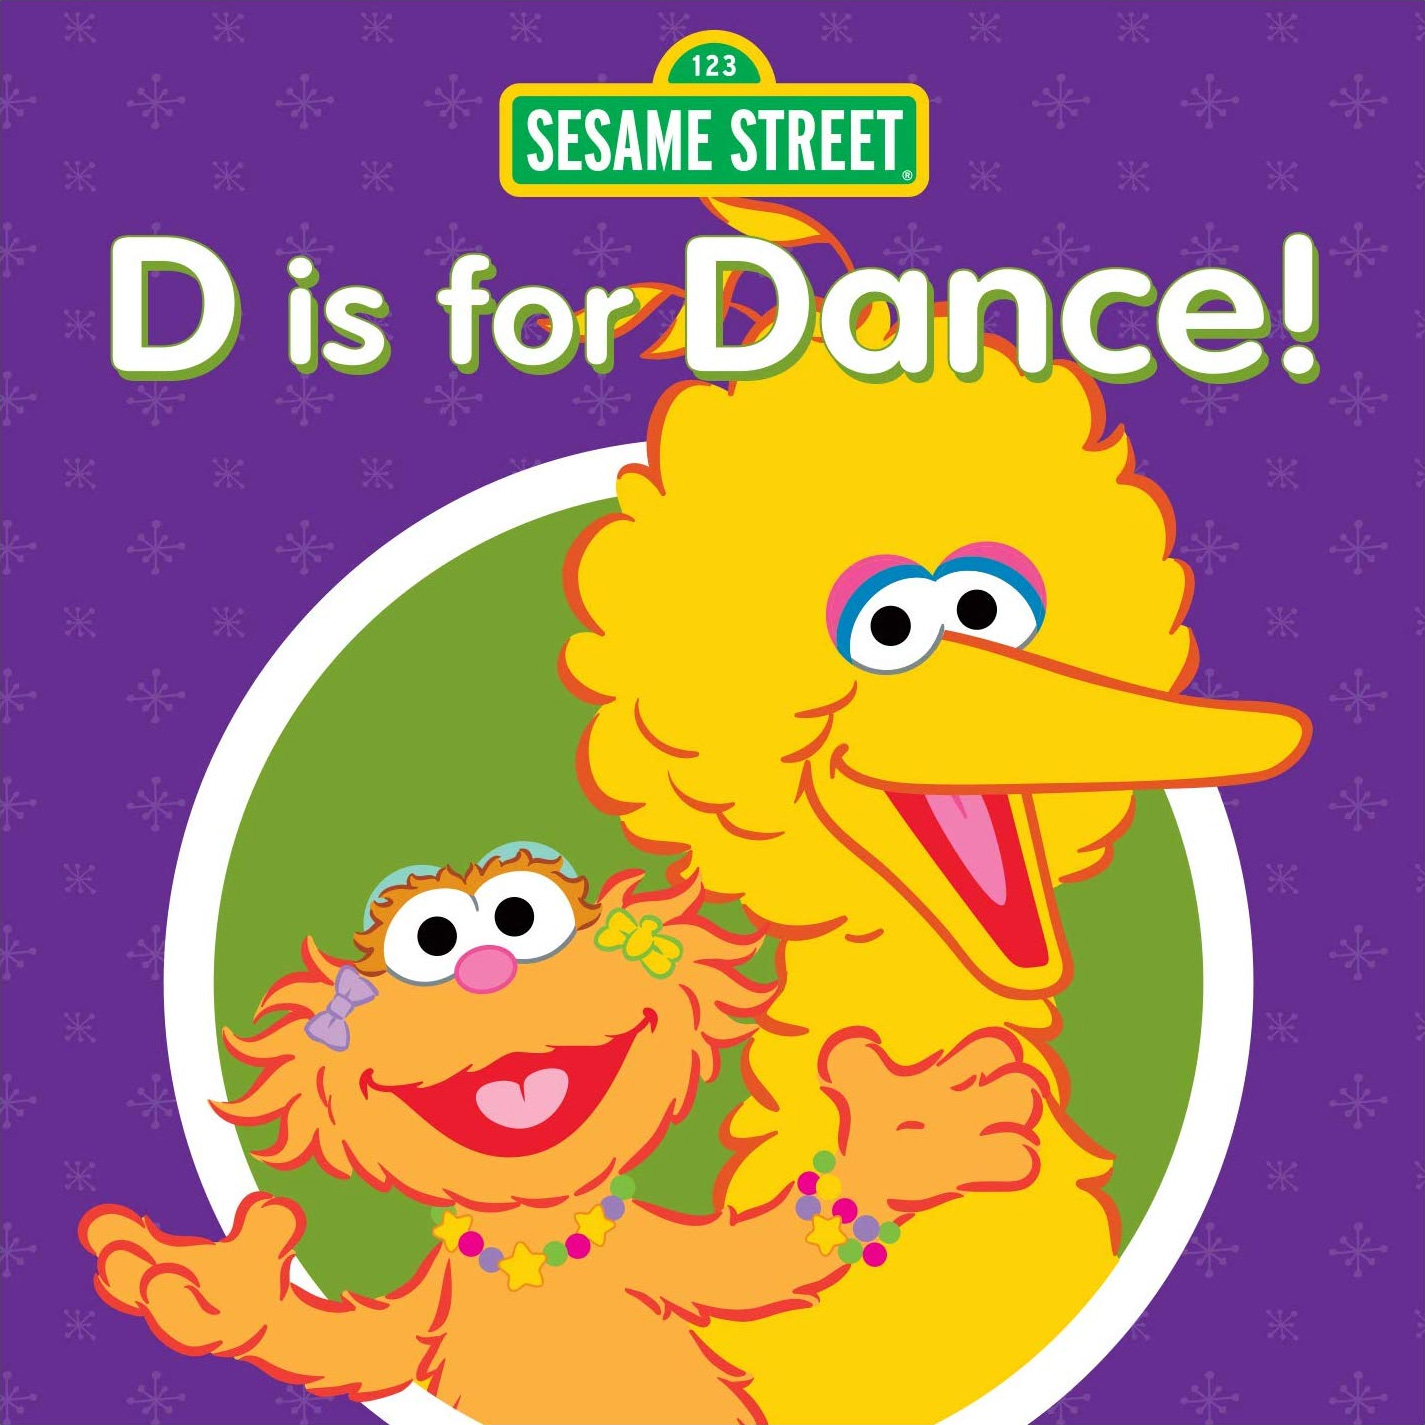 D is for Dance! | Muppet Wiki | FANDOM powered by Wikia